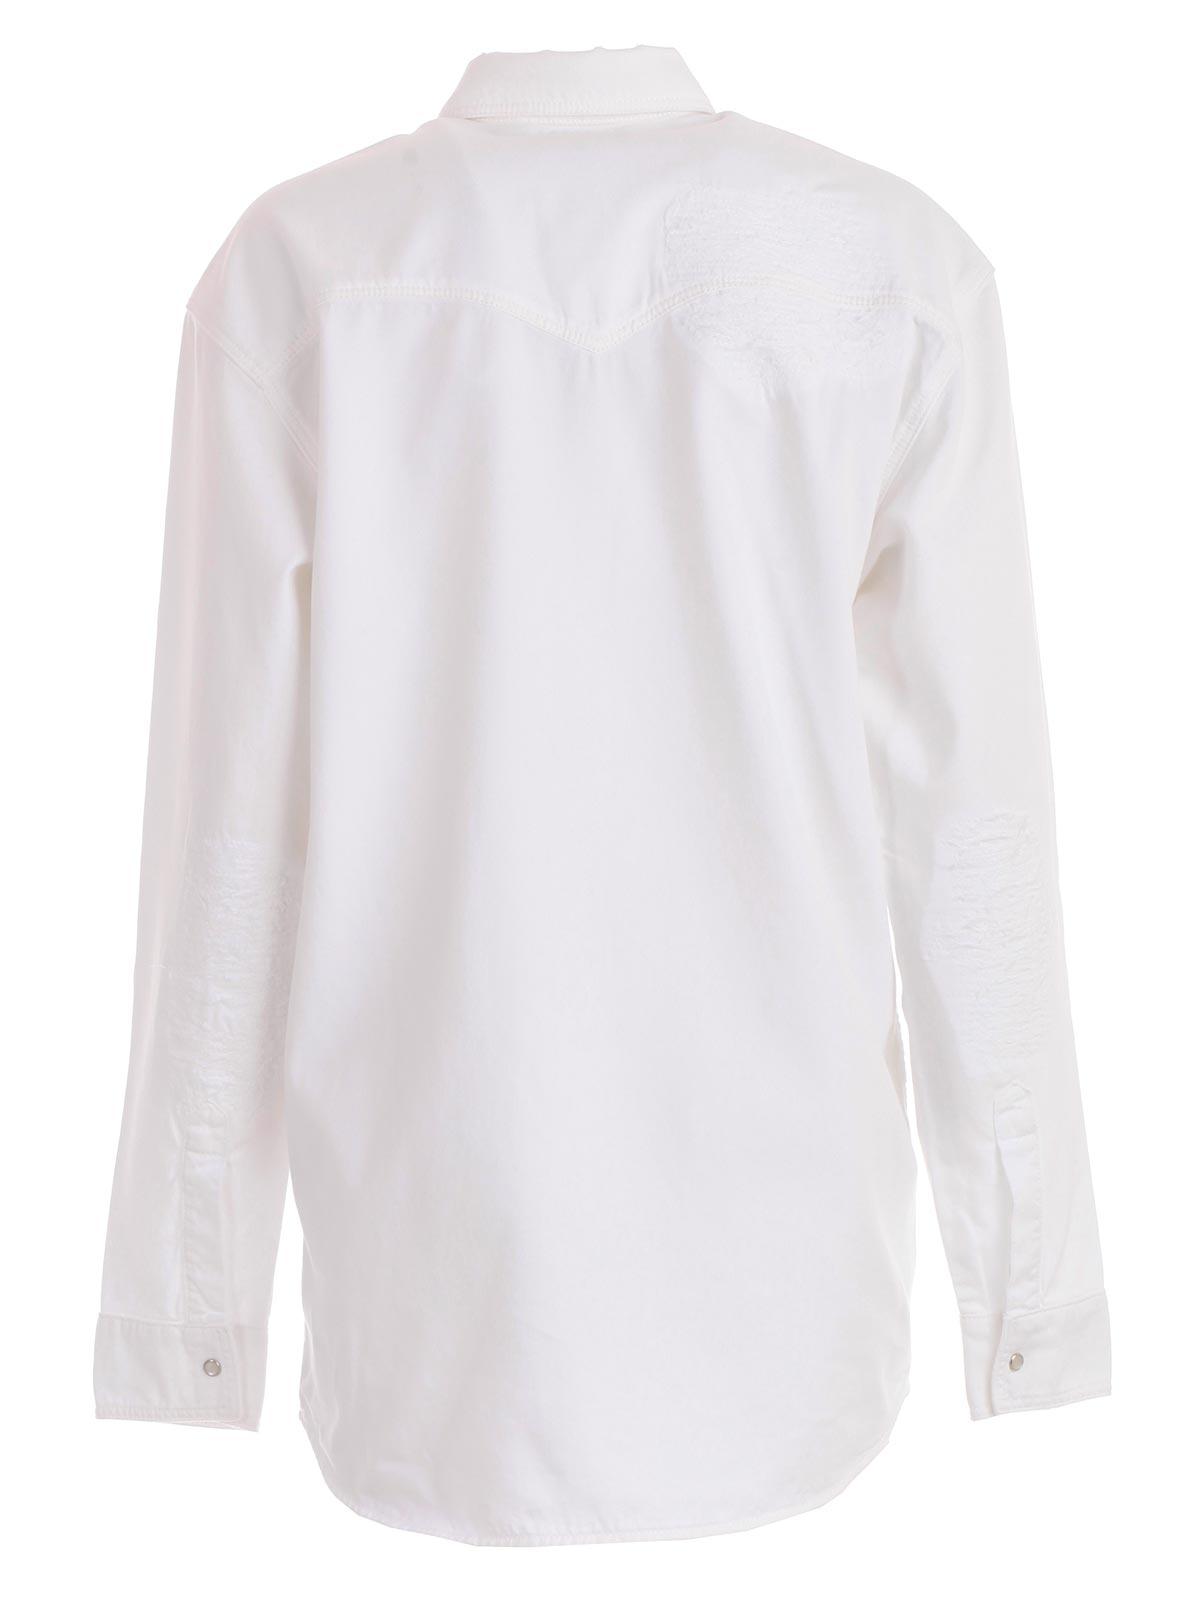 Picture of Faith Connexion Shirt